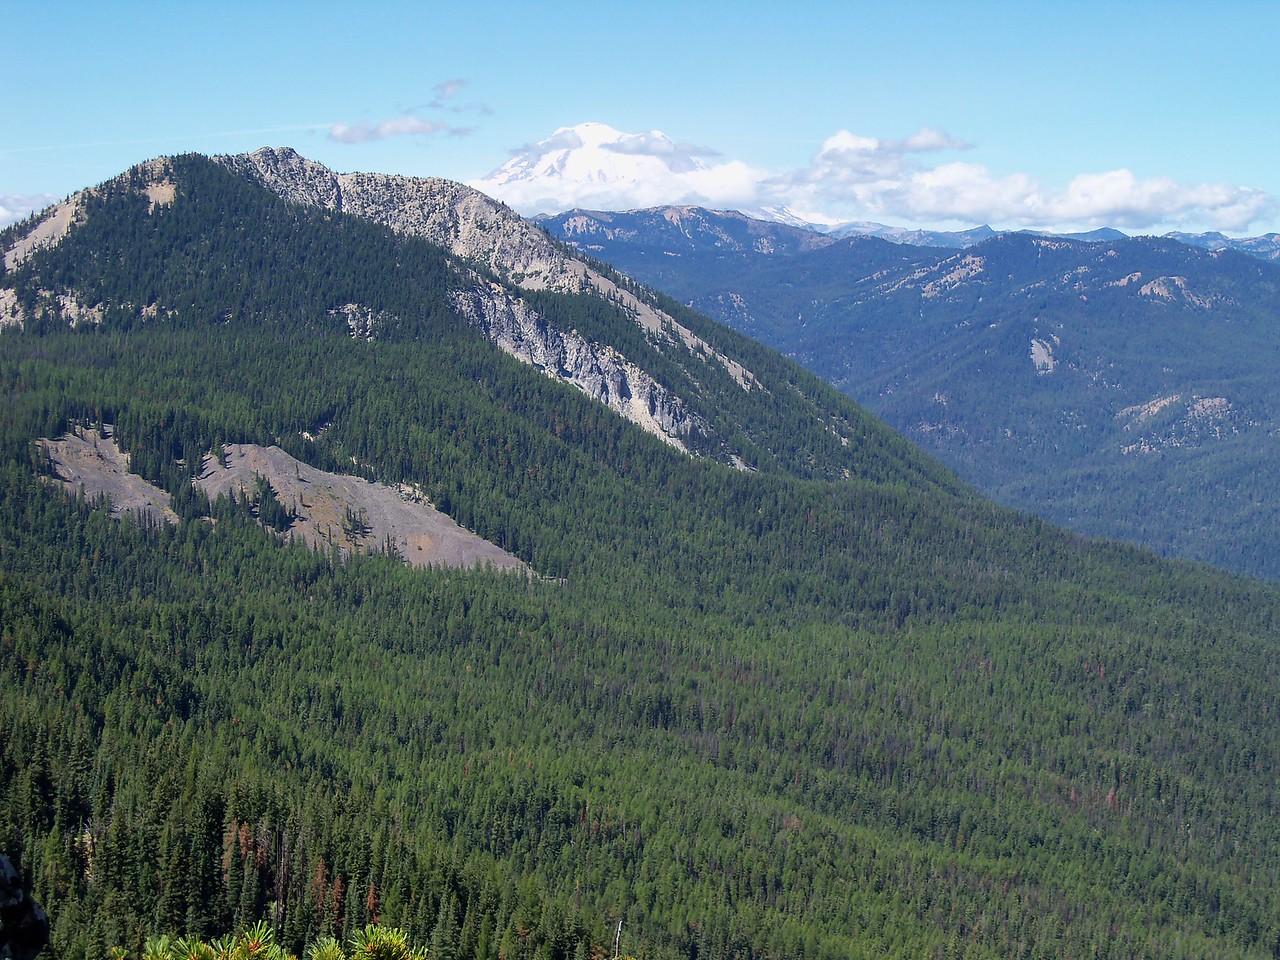 Tuesday's ride, Mt Rainier from Little Bald Mt.